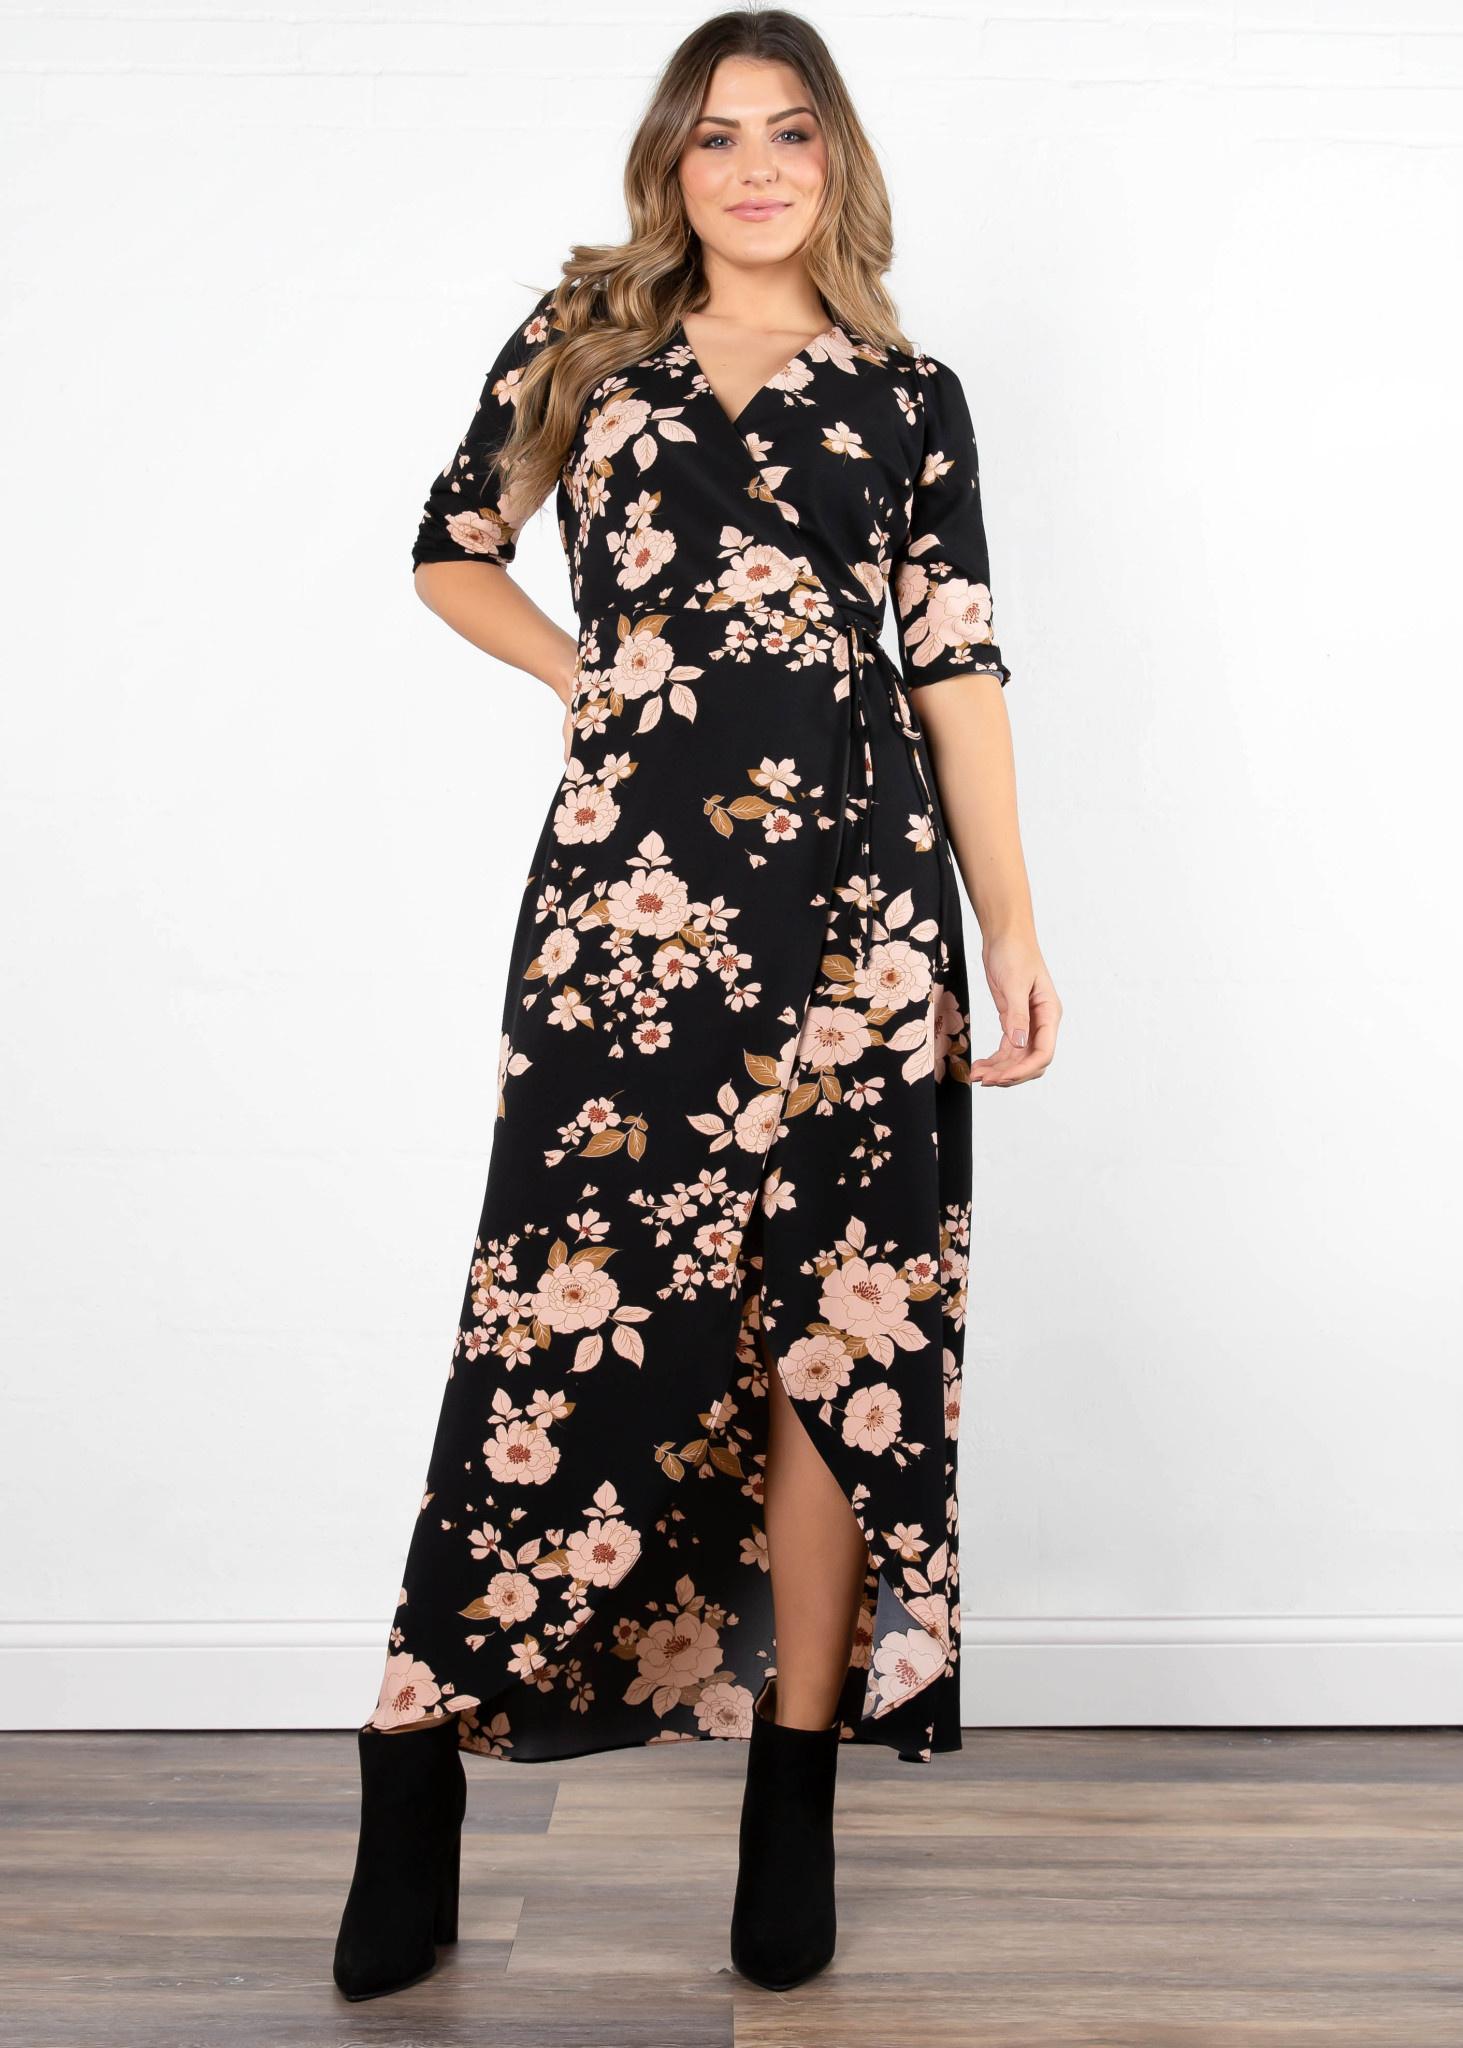 FINAL ROSE FLORAL MAXI DRESS